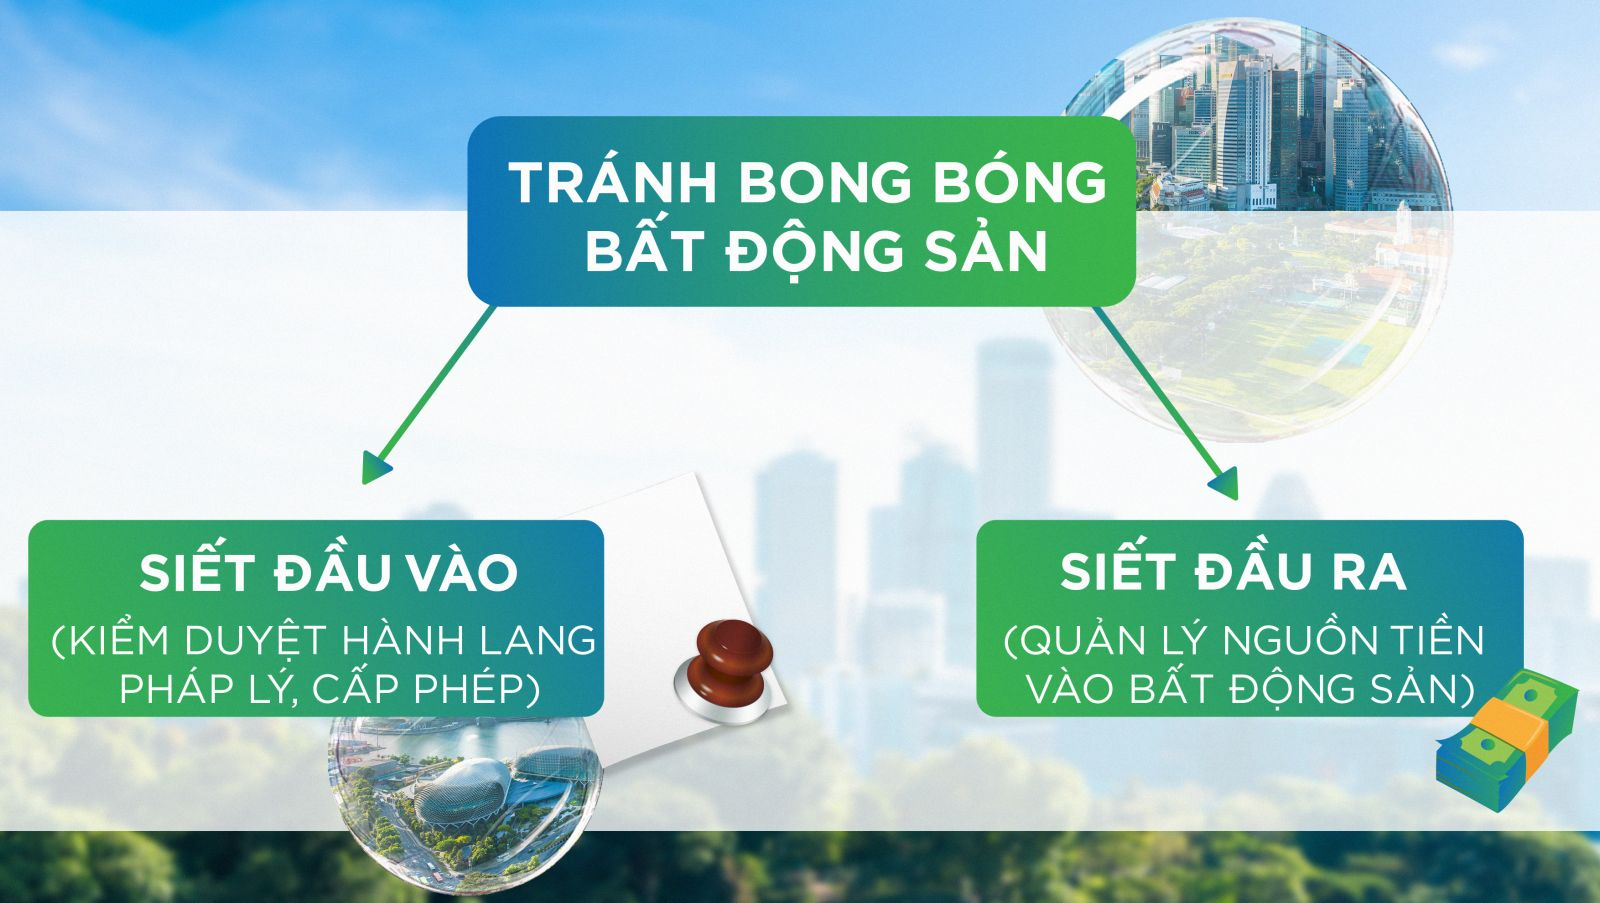 siet-tin-dung-cho-vay-bat-dong-san-2